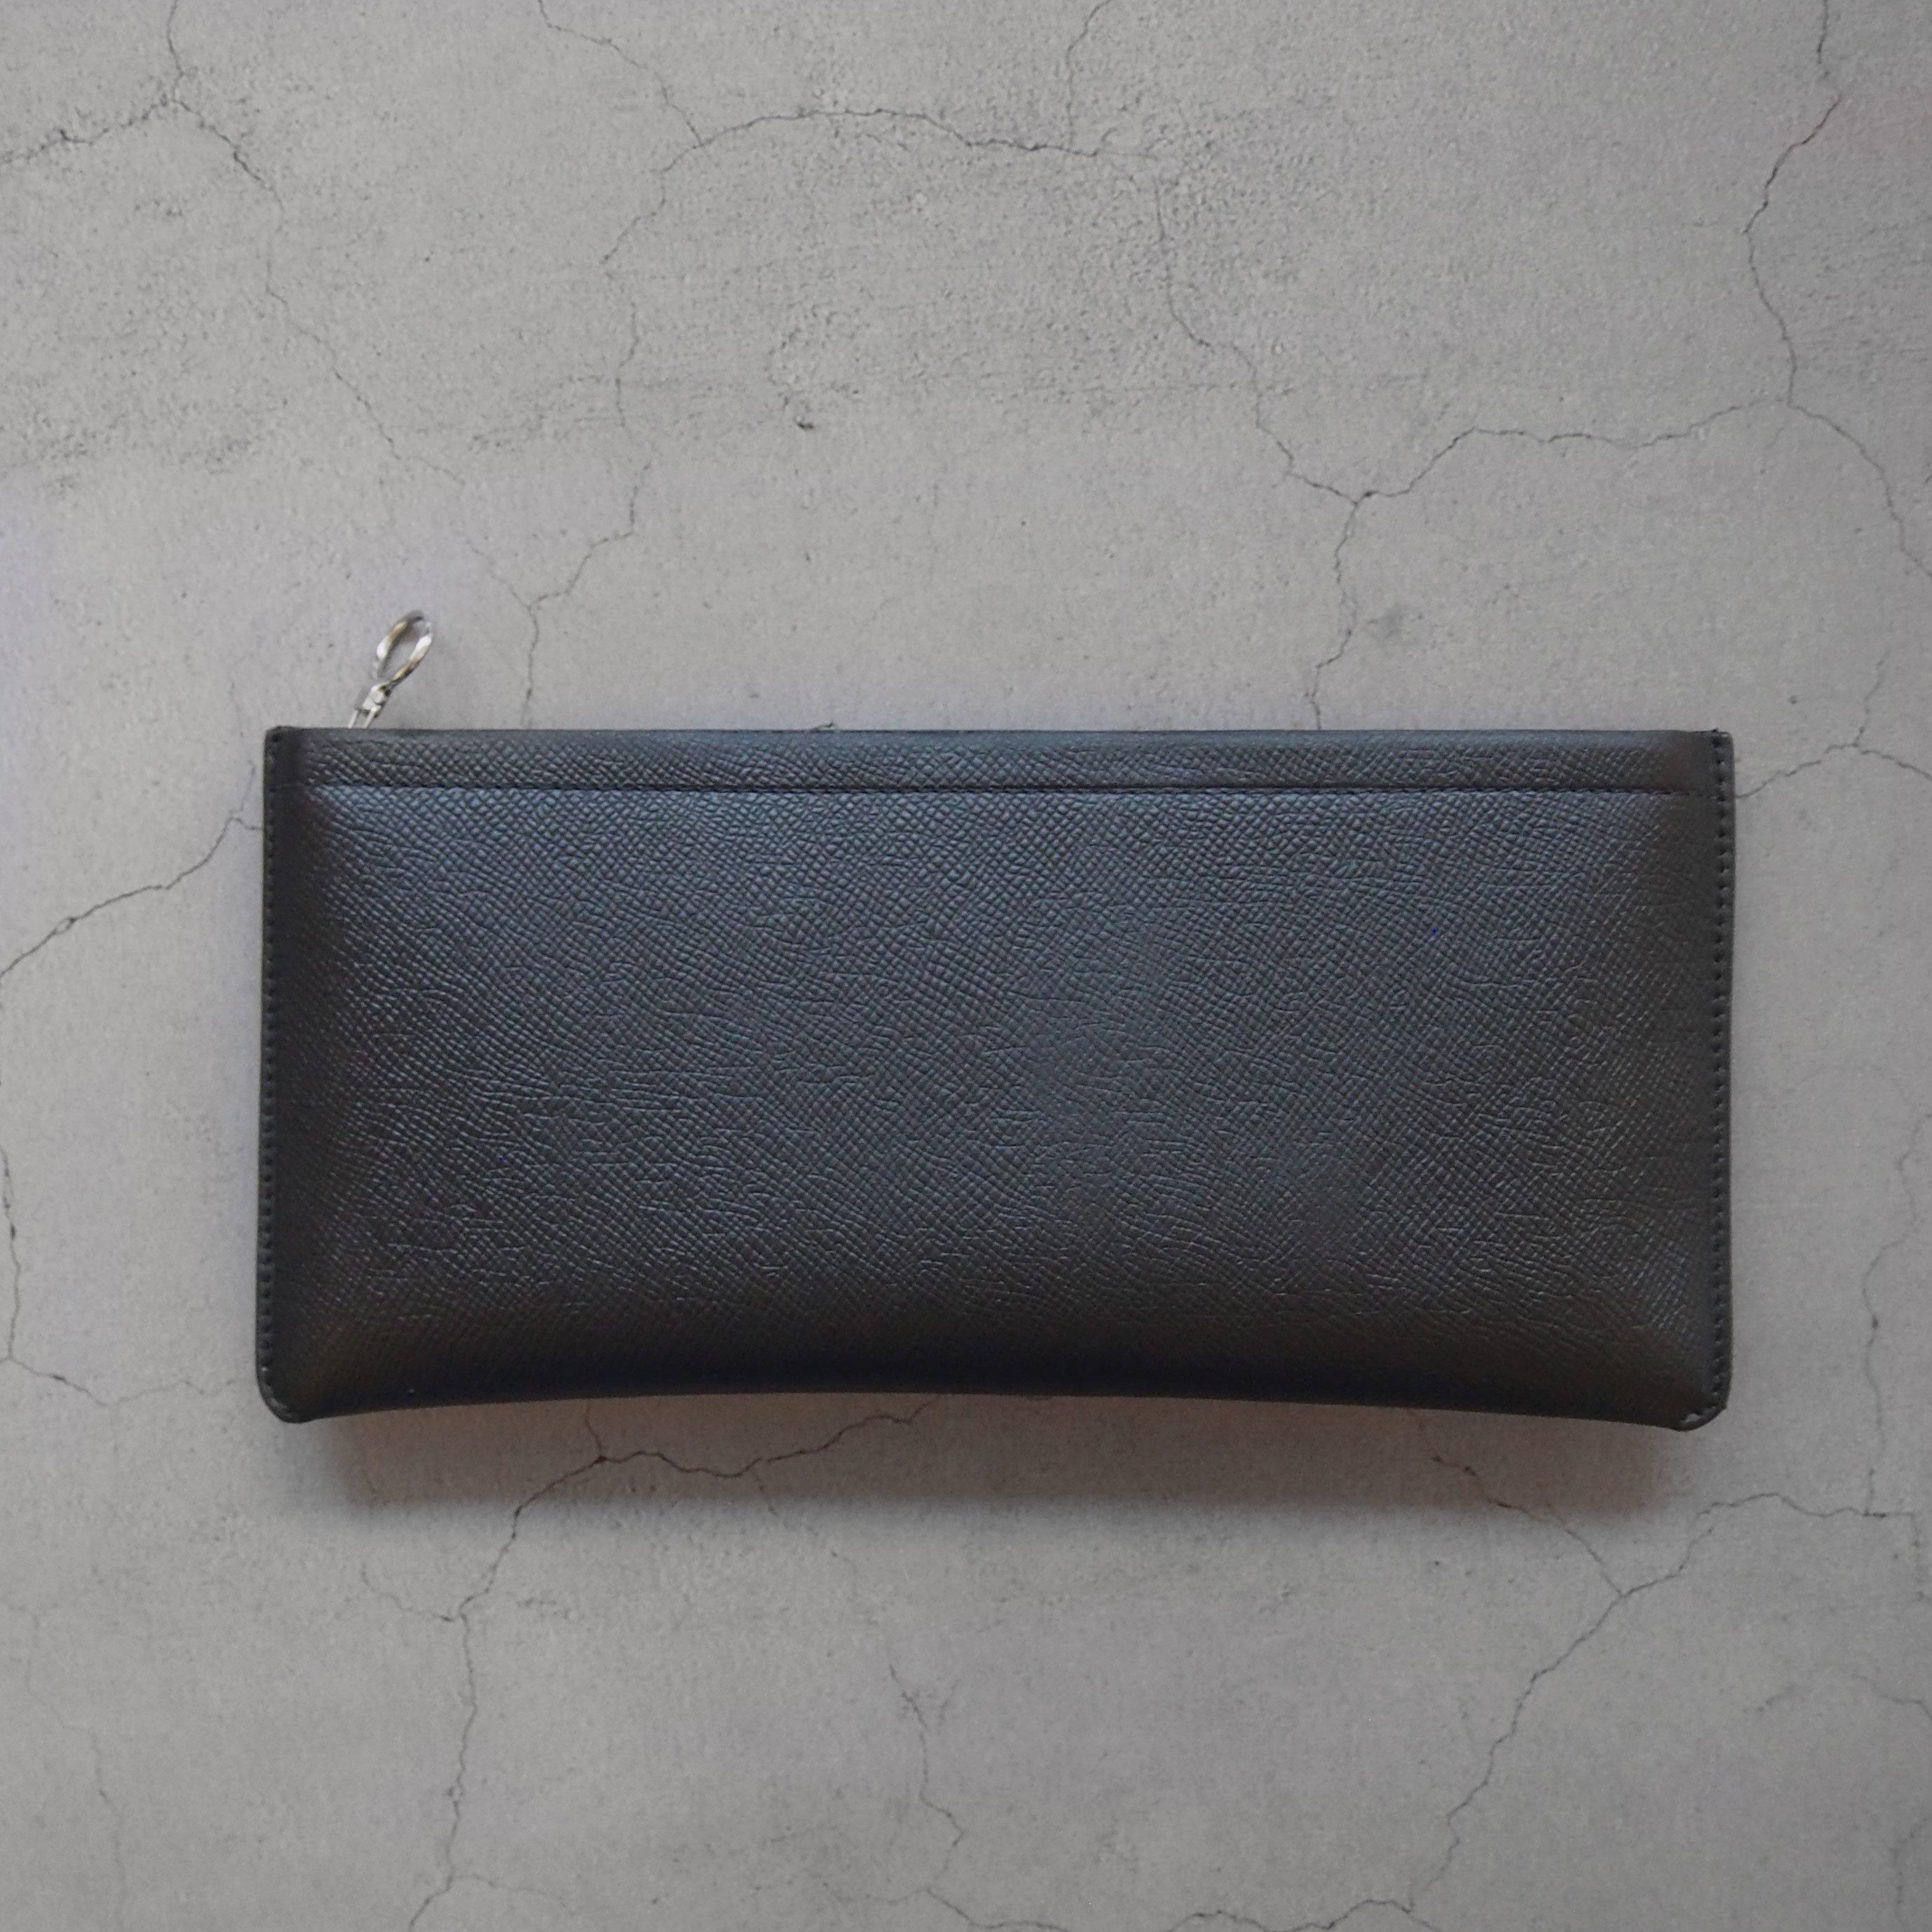 Aeta BI05 BIG LONG WALLET BLACK/SILVER